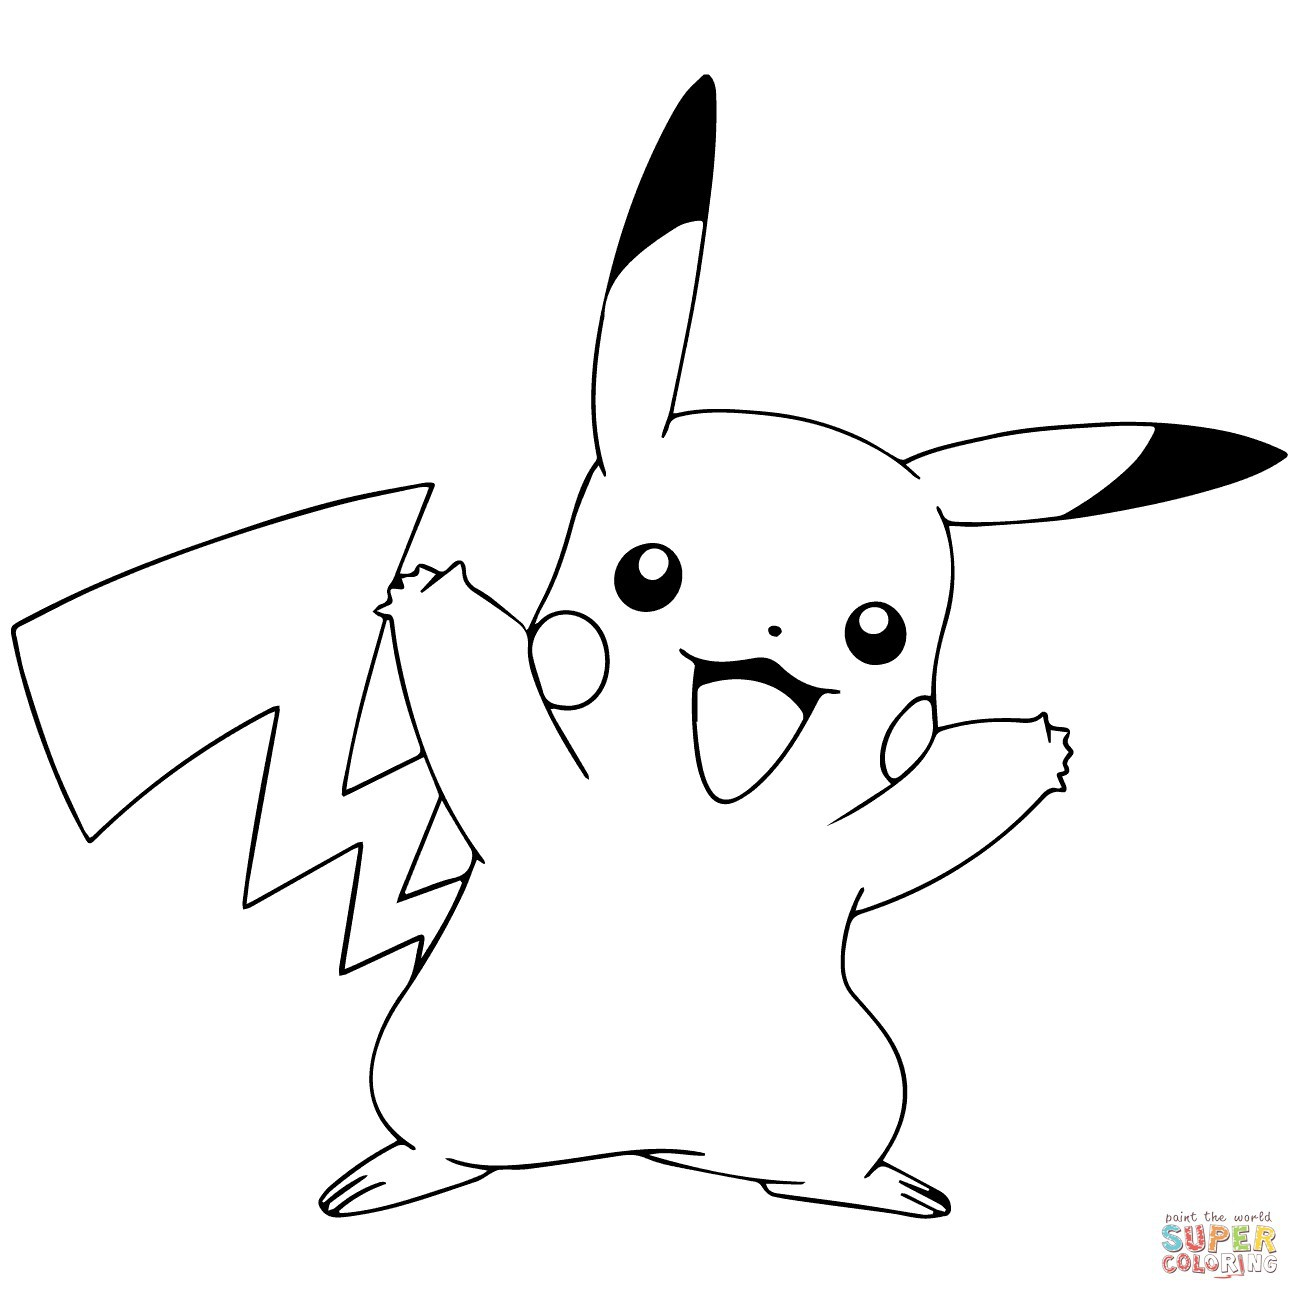 Pikachu Pokemon Go Coloring Pages - BubaKids.com